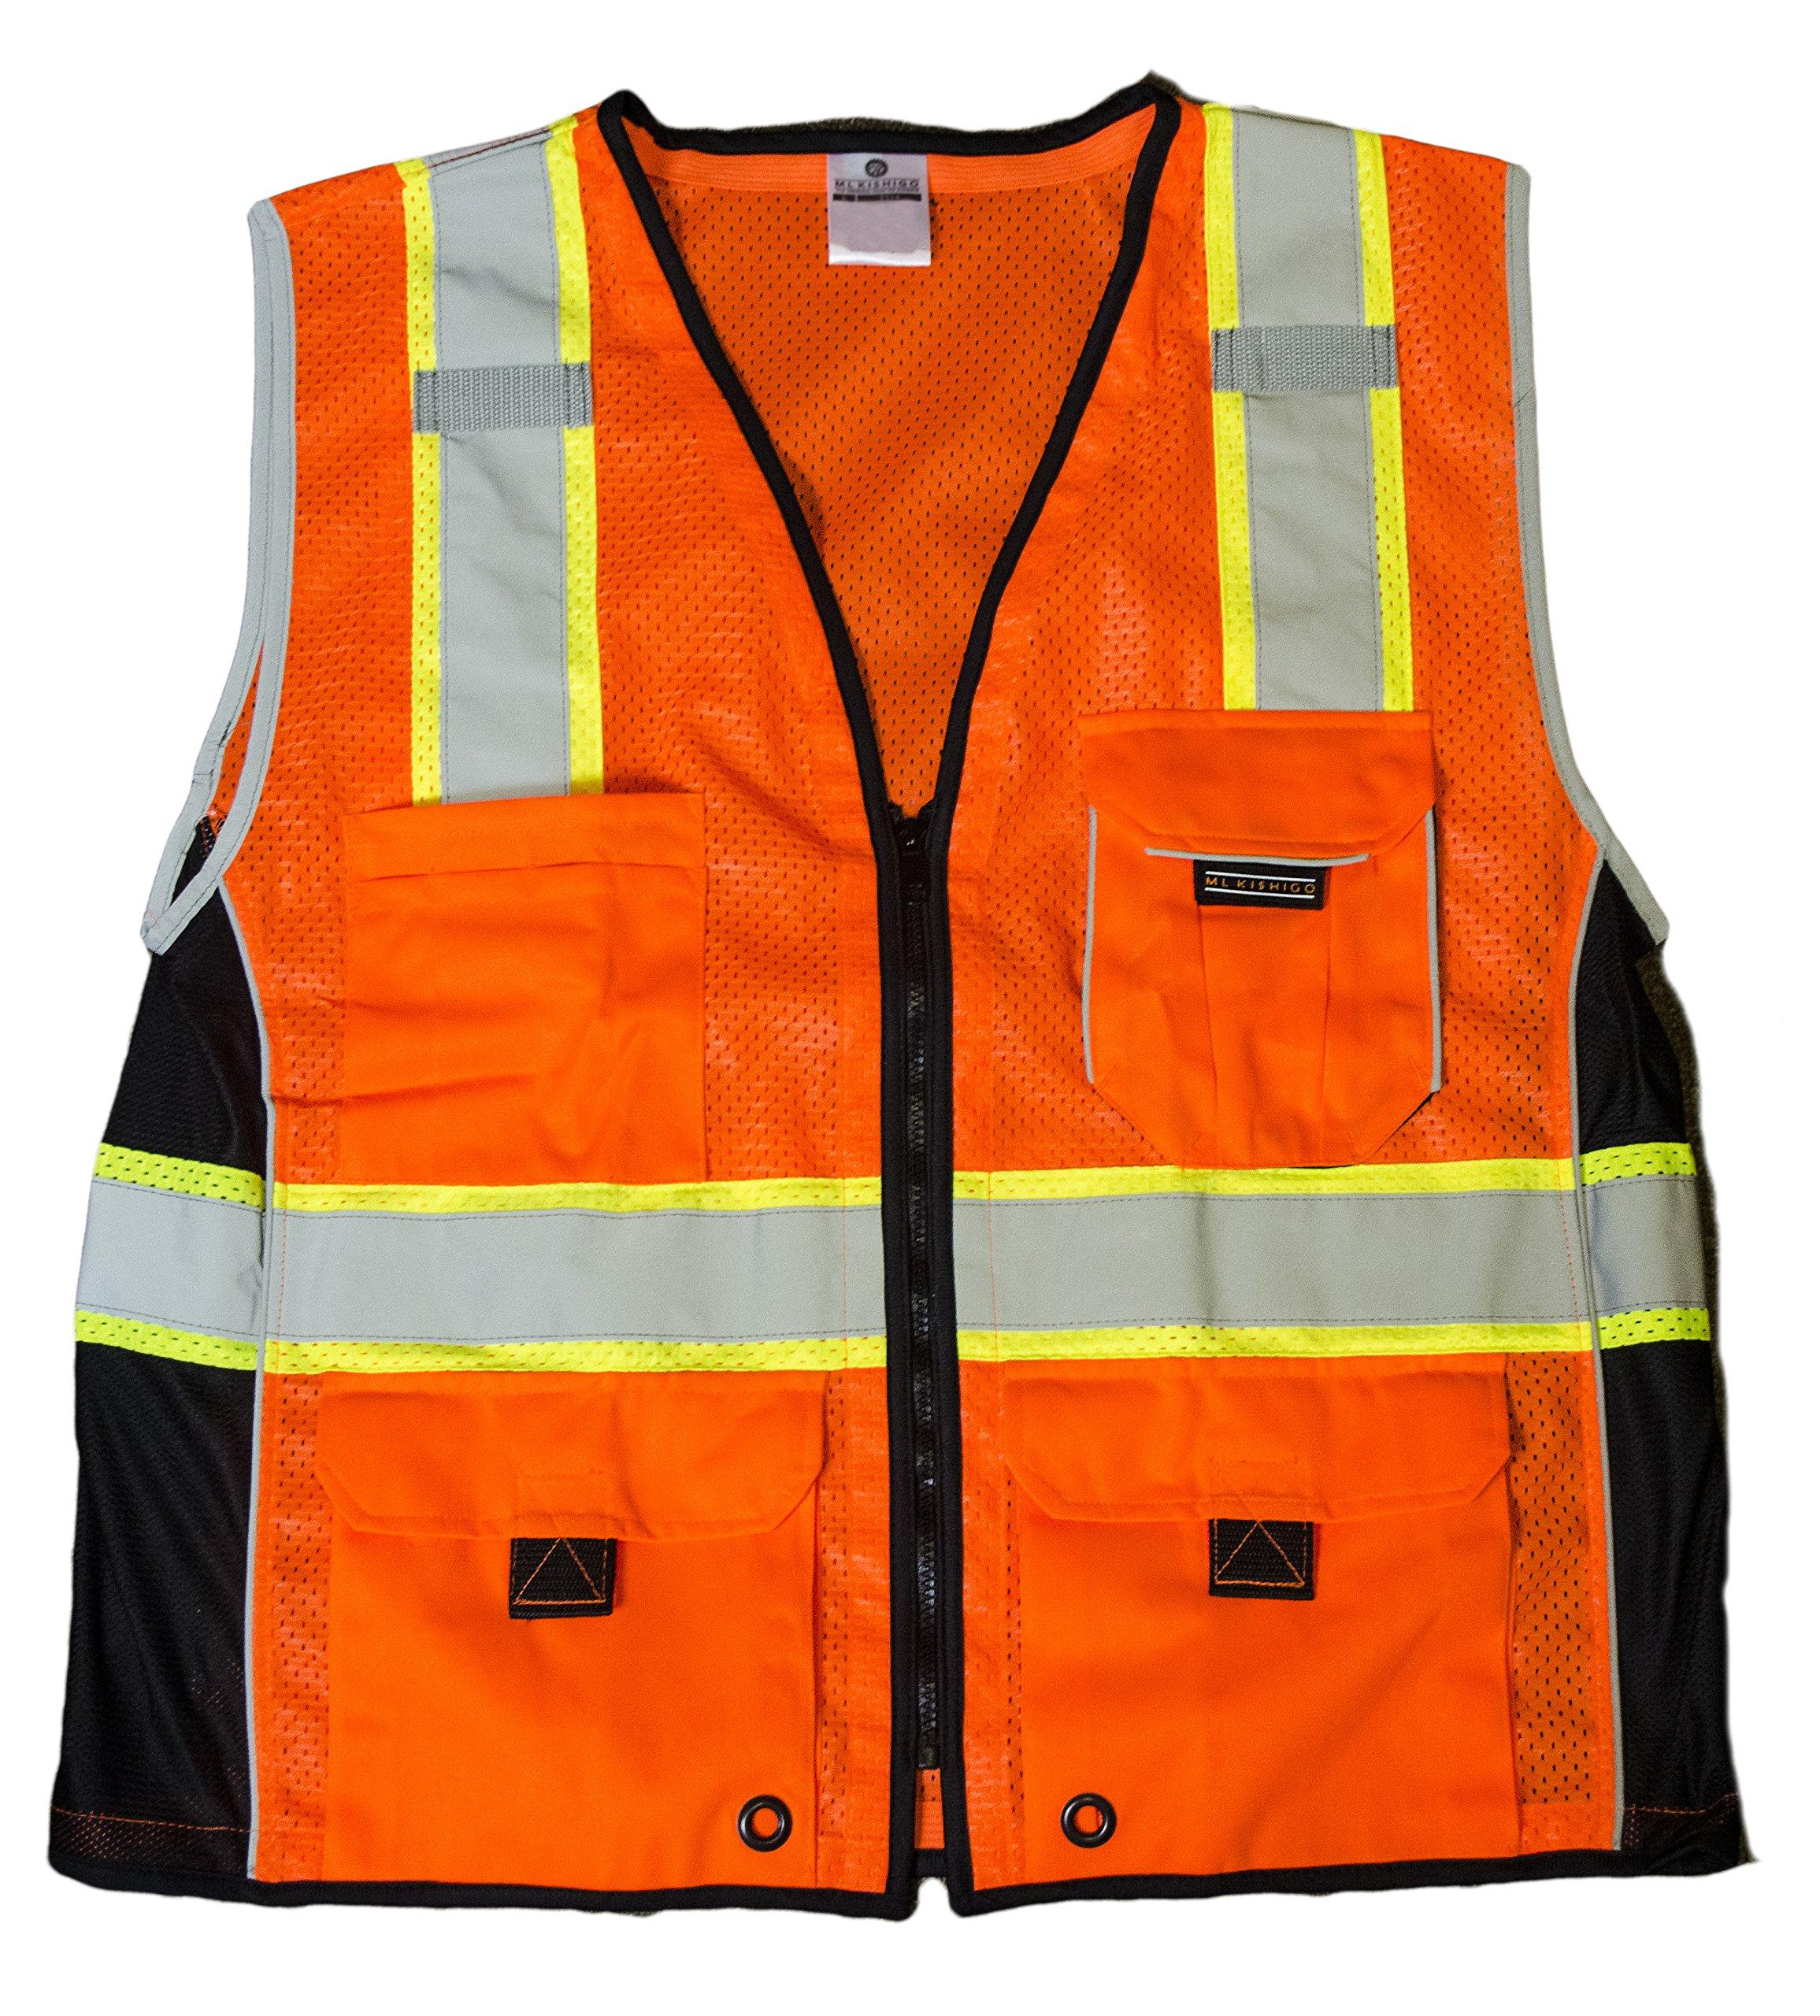 ML Kishigo 1514 Ultra-Cool Polyester Black Series Heavy Duty Vest, Large, Orange